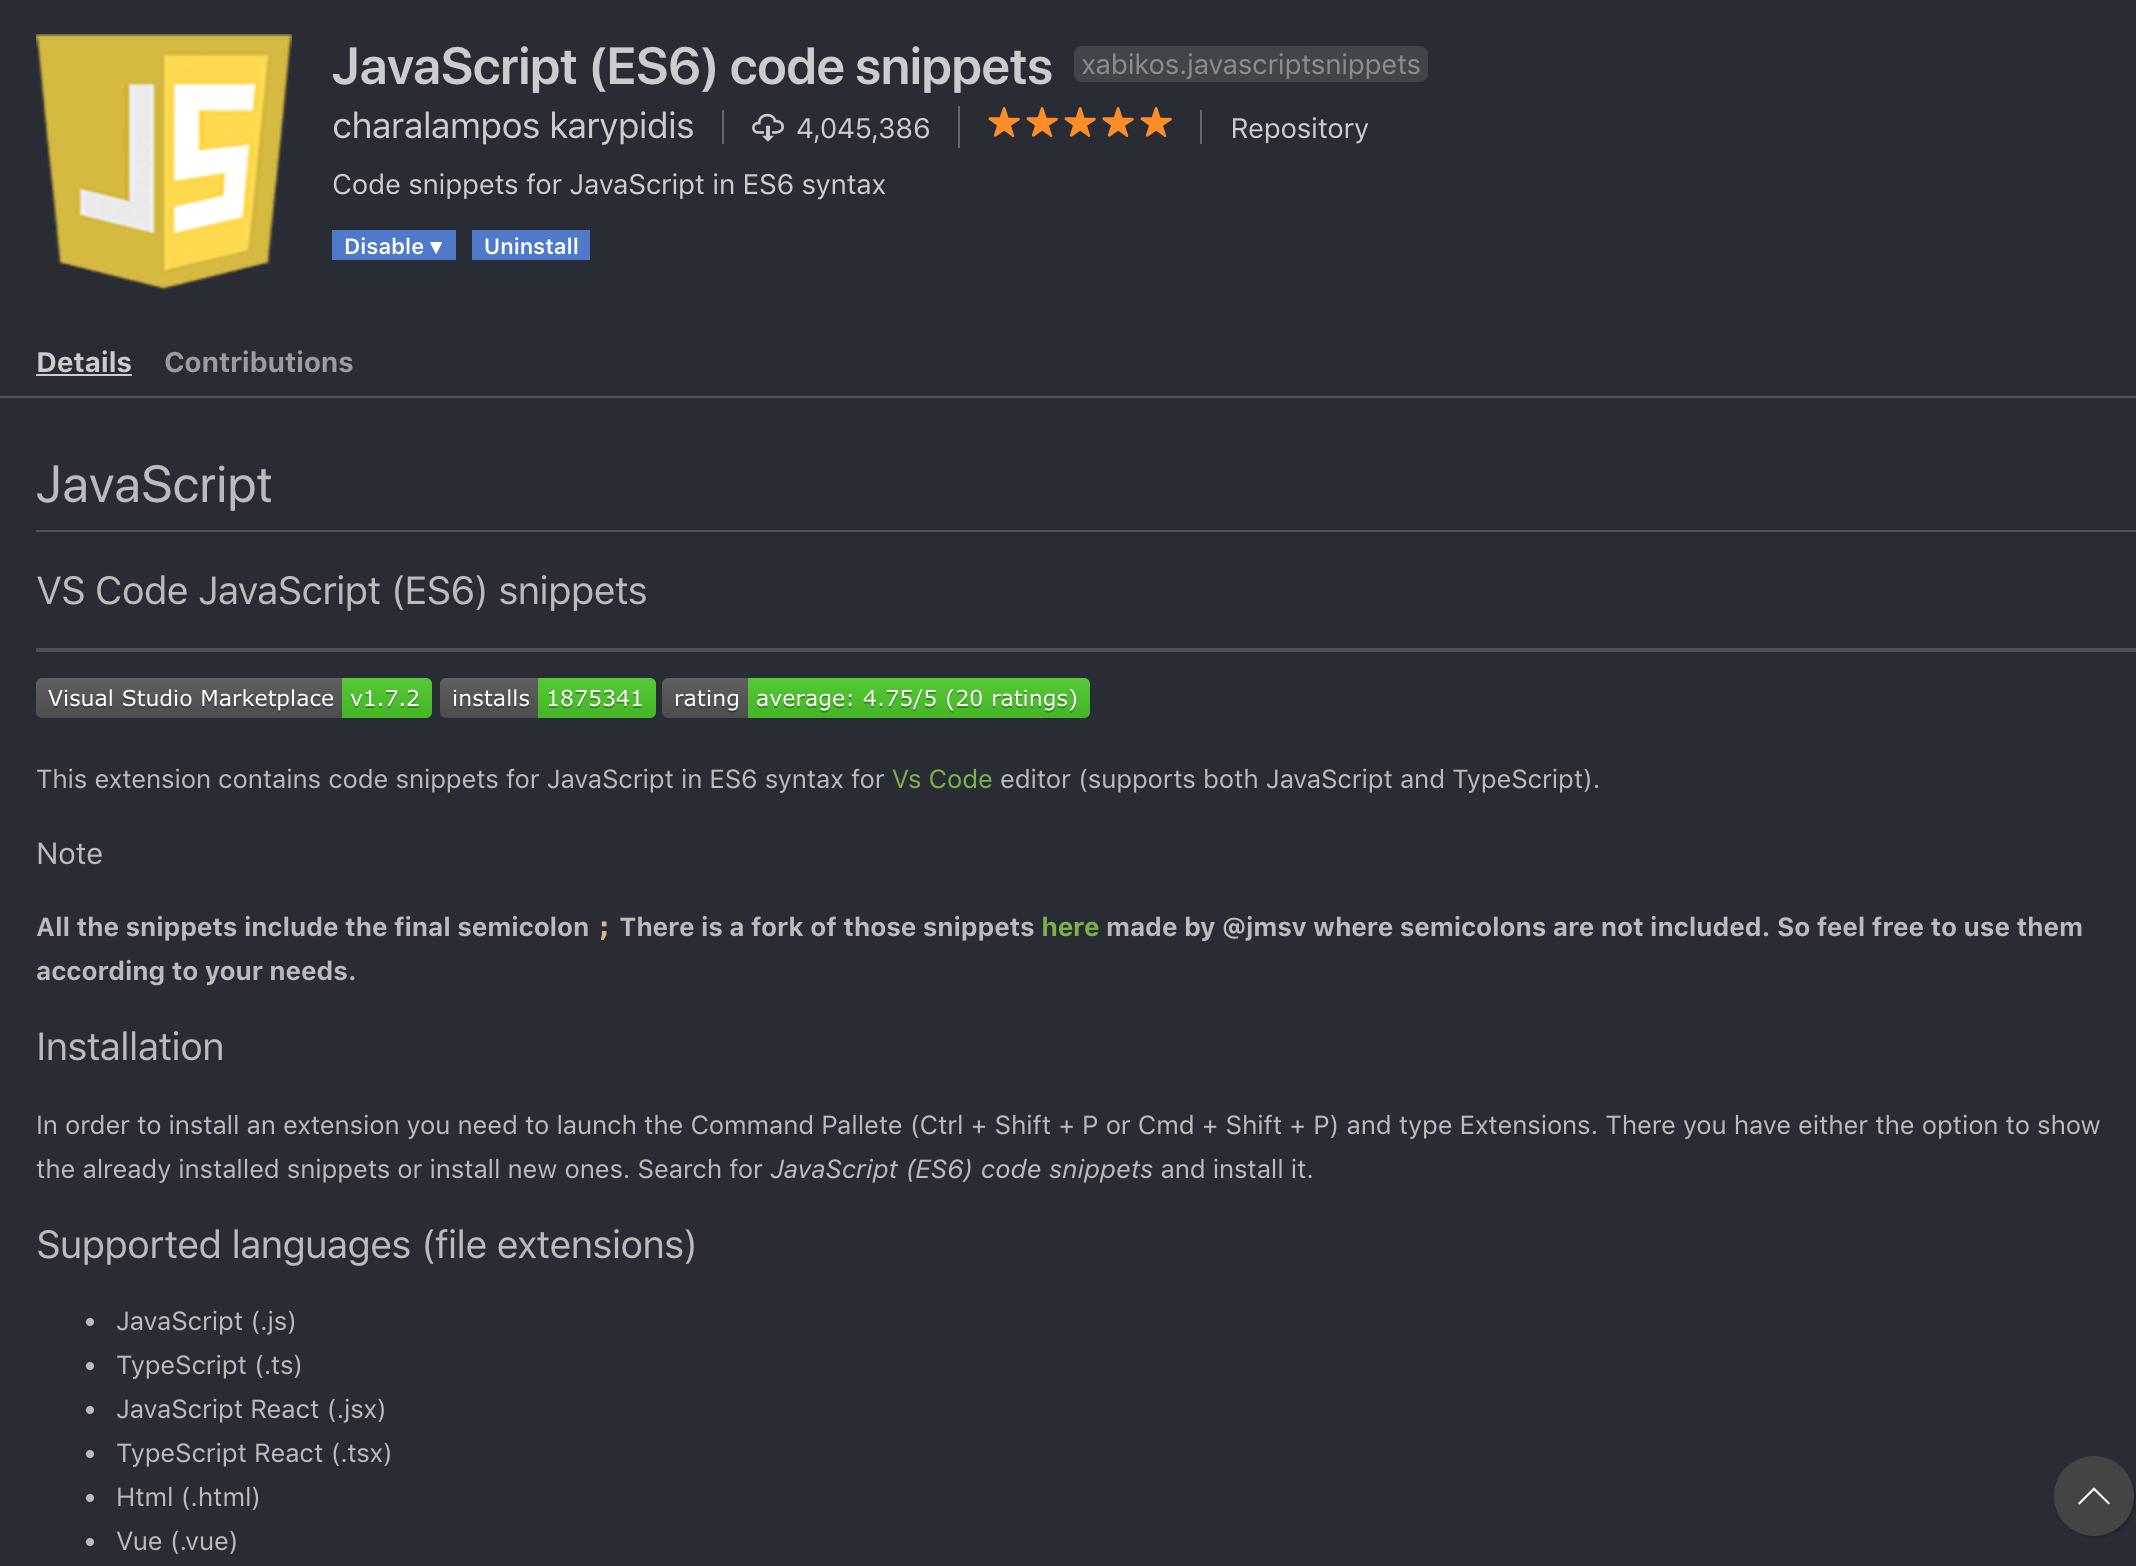 JavaScript (ES6) Code Snippets